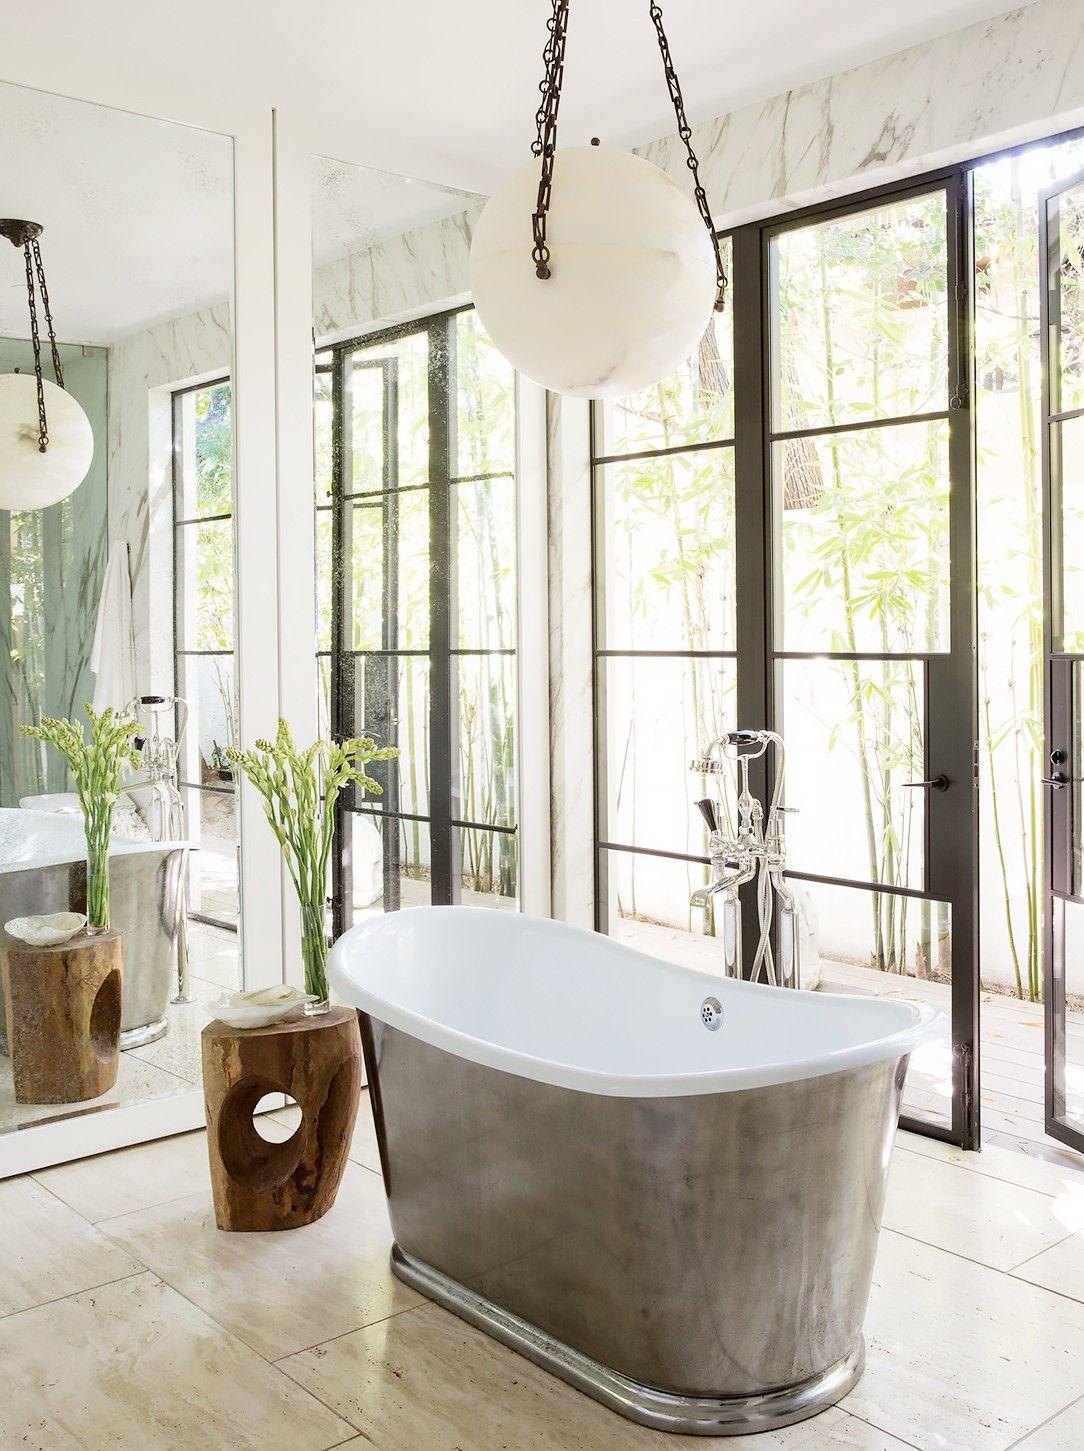 The Dreamiest Bathtubs to Assuage Your Instagram Envy | Bathtubs ...